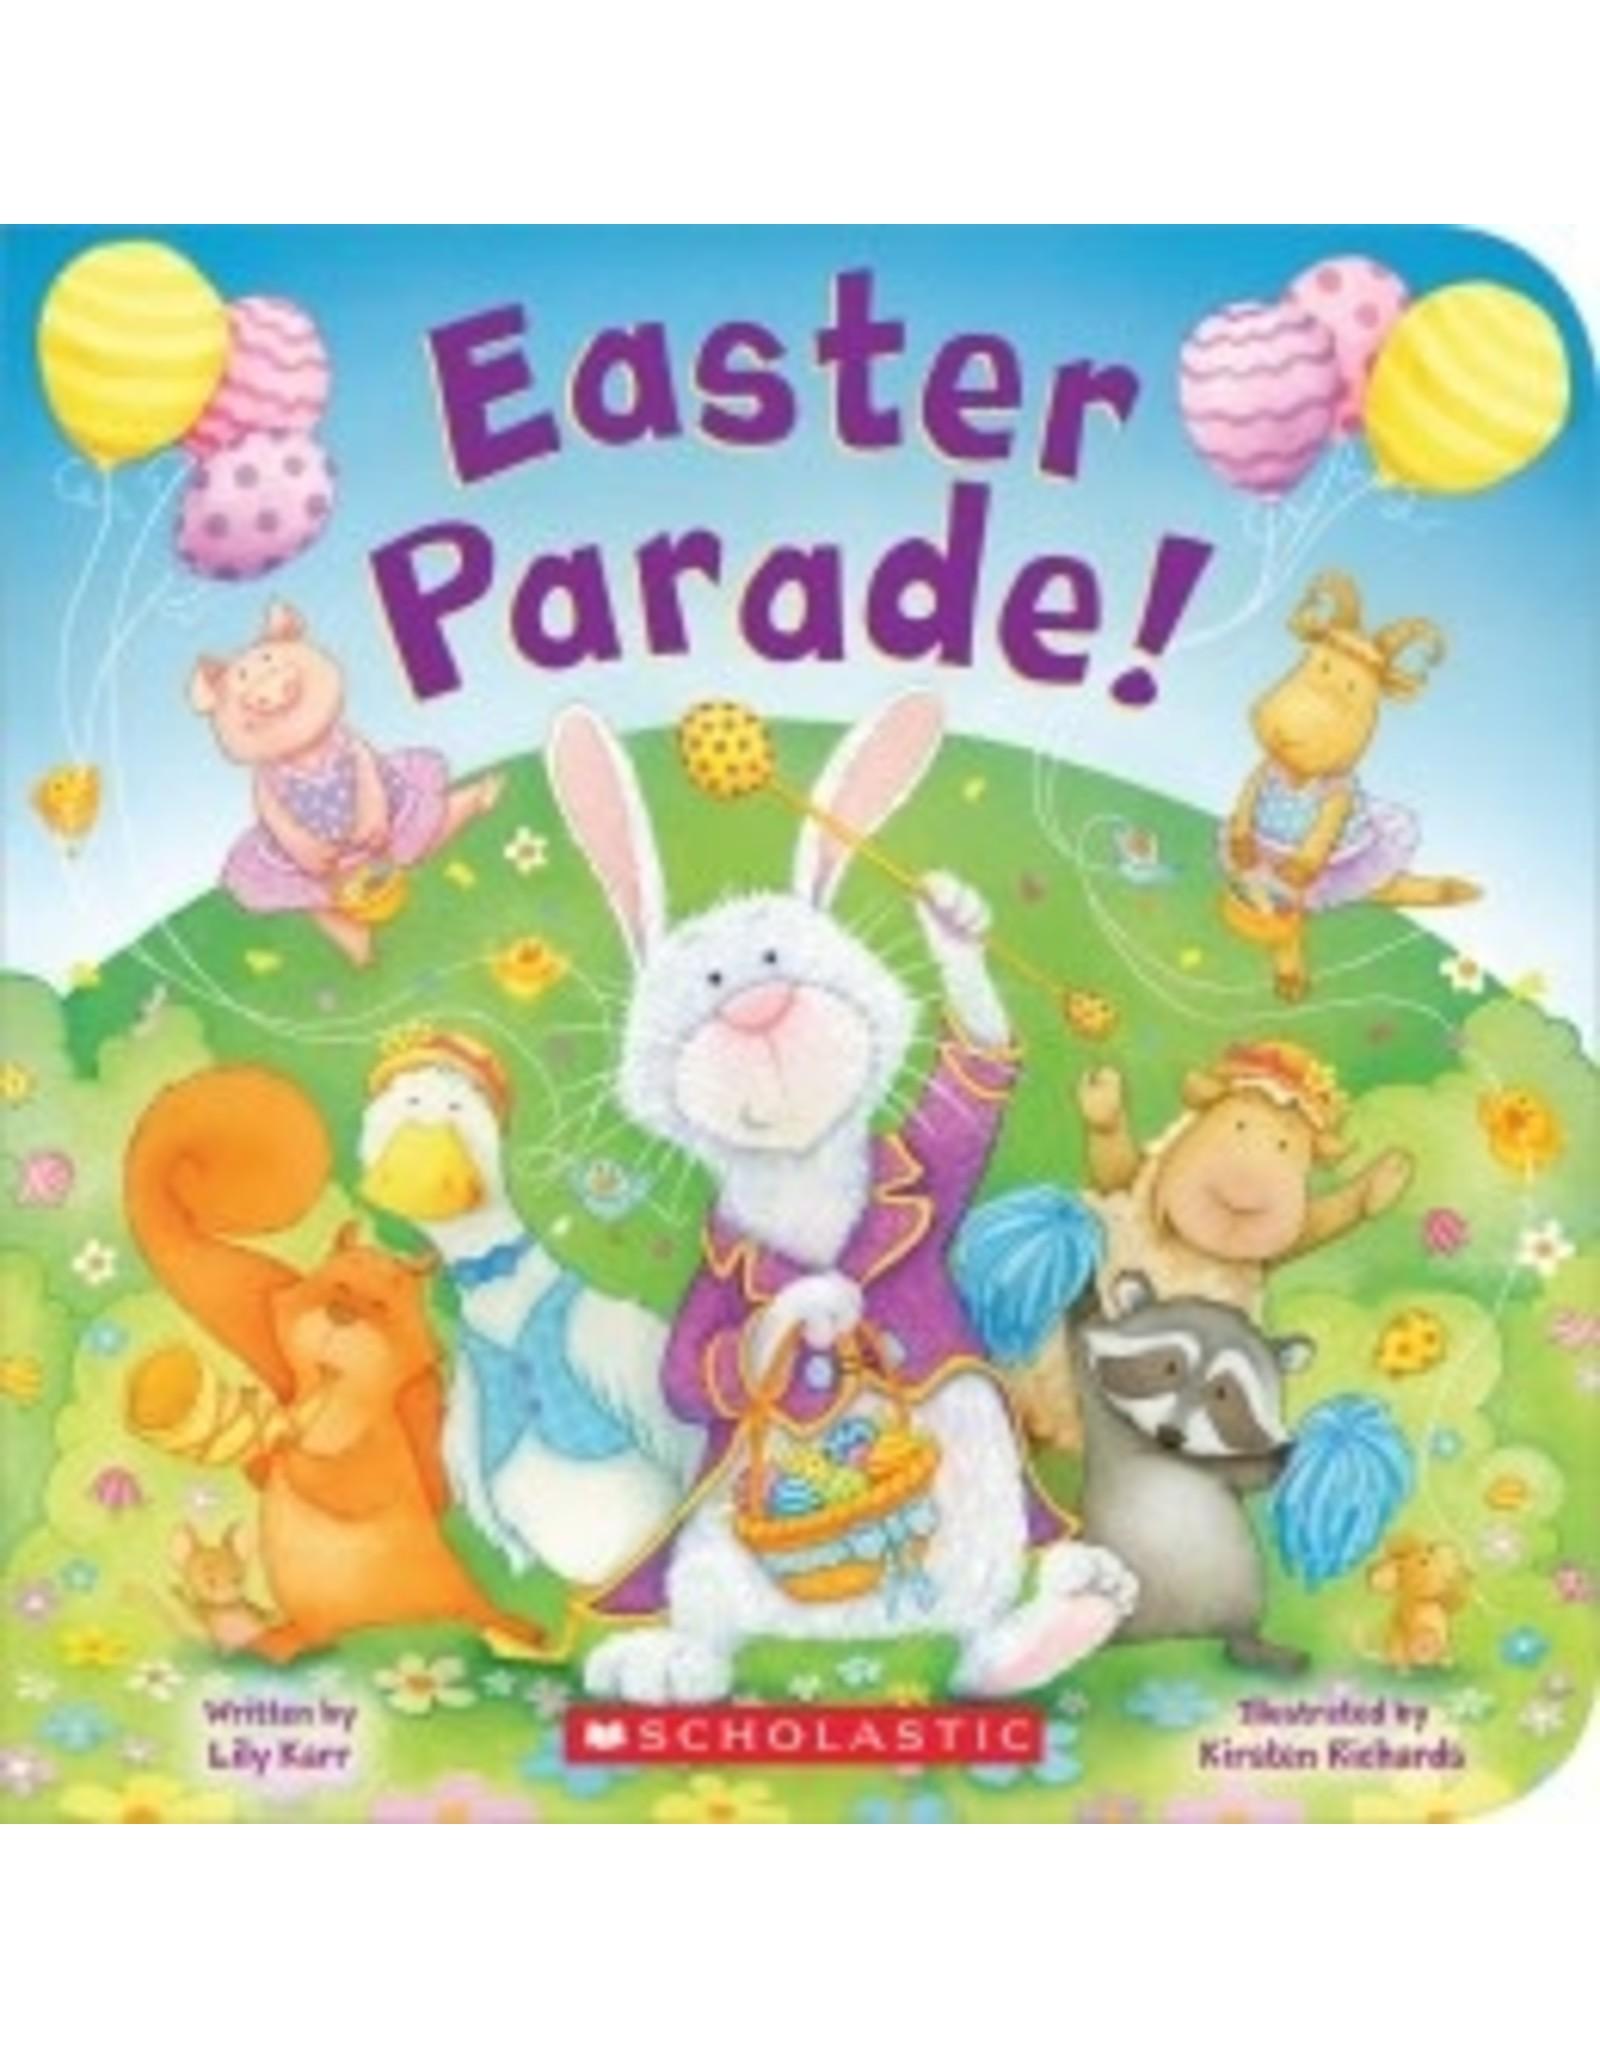 Scholastic Easter Parade